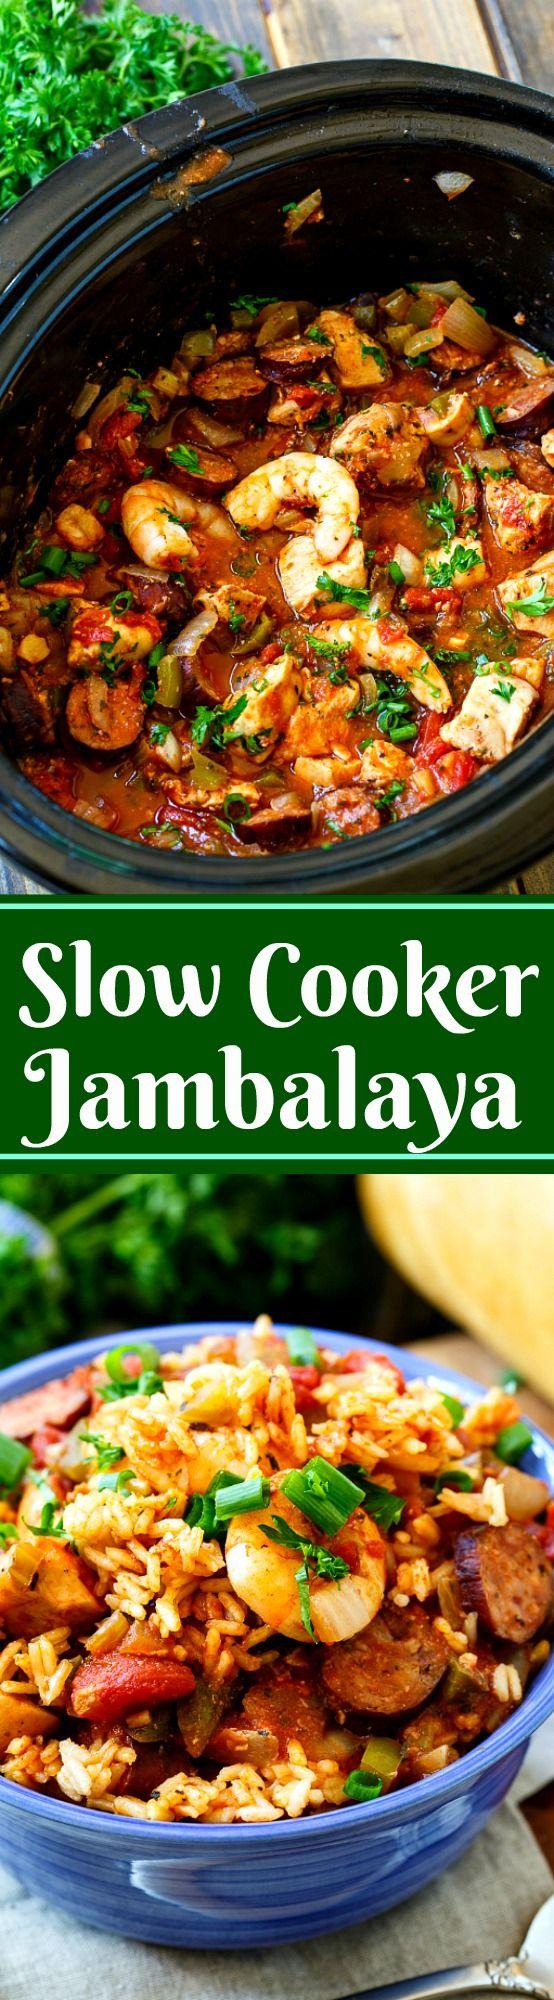 Slow Cooker Jambalaya with chicken, sausage, and shrimp.